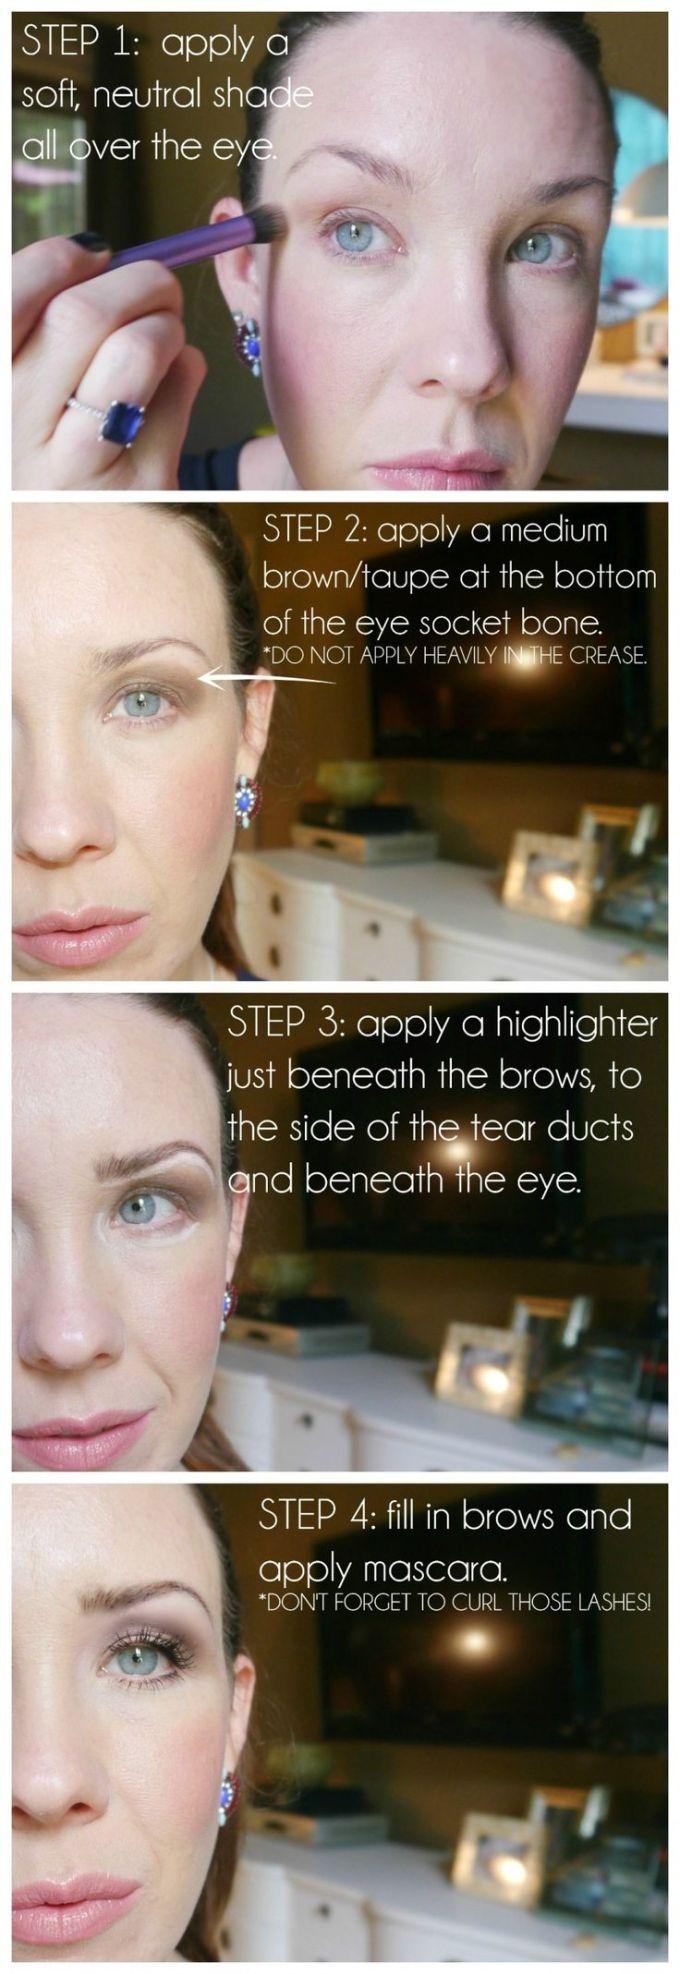 Eye Makeup Tips For Droopy Eyes Jidimakeup